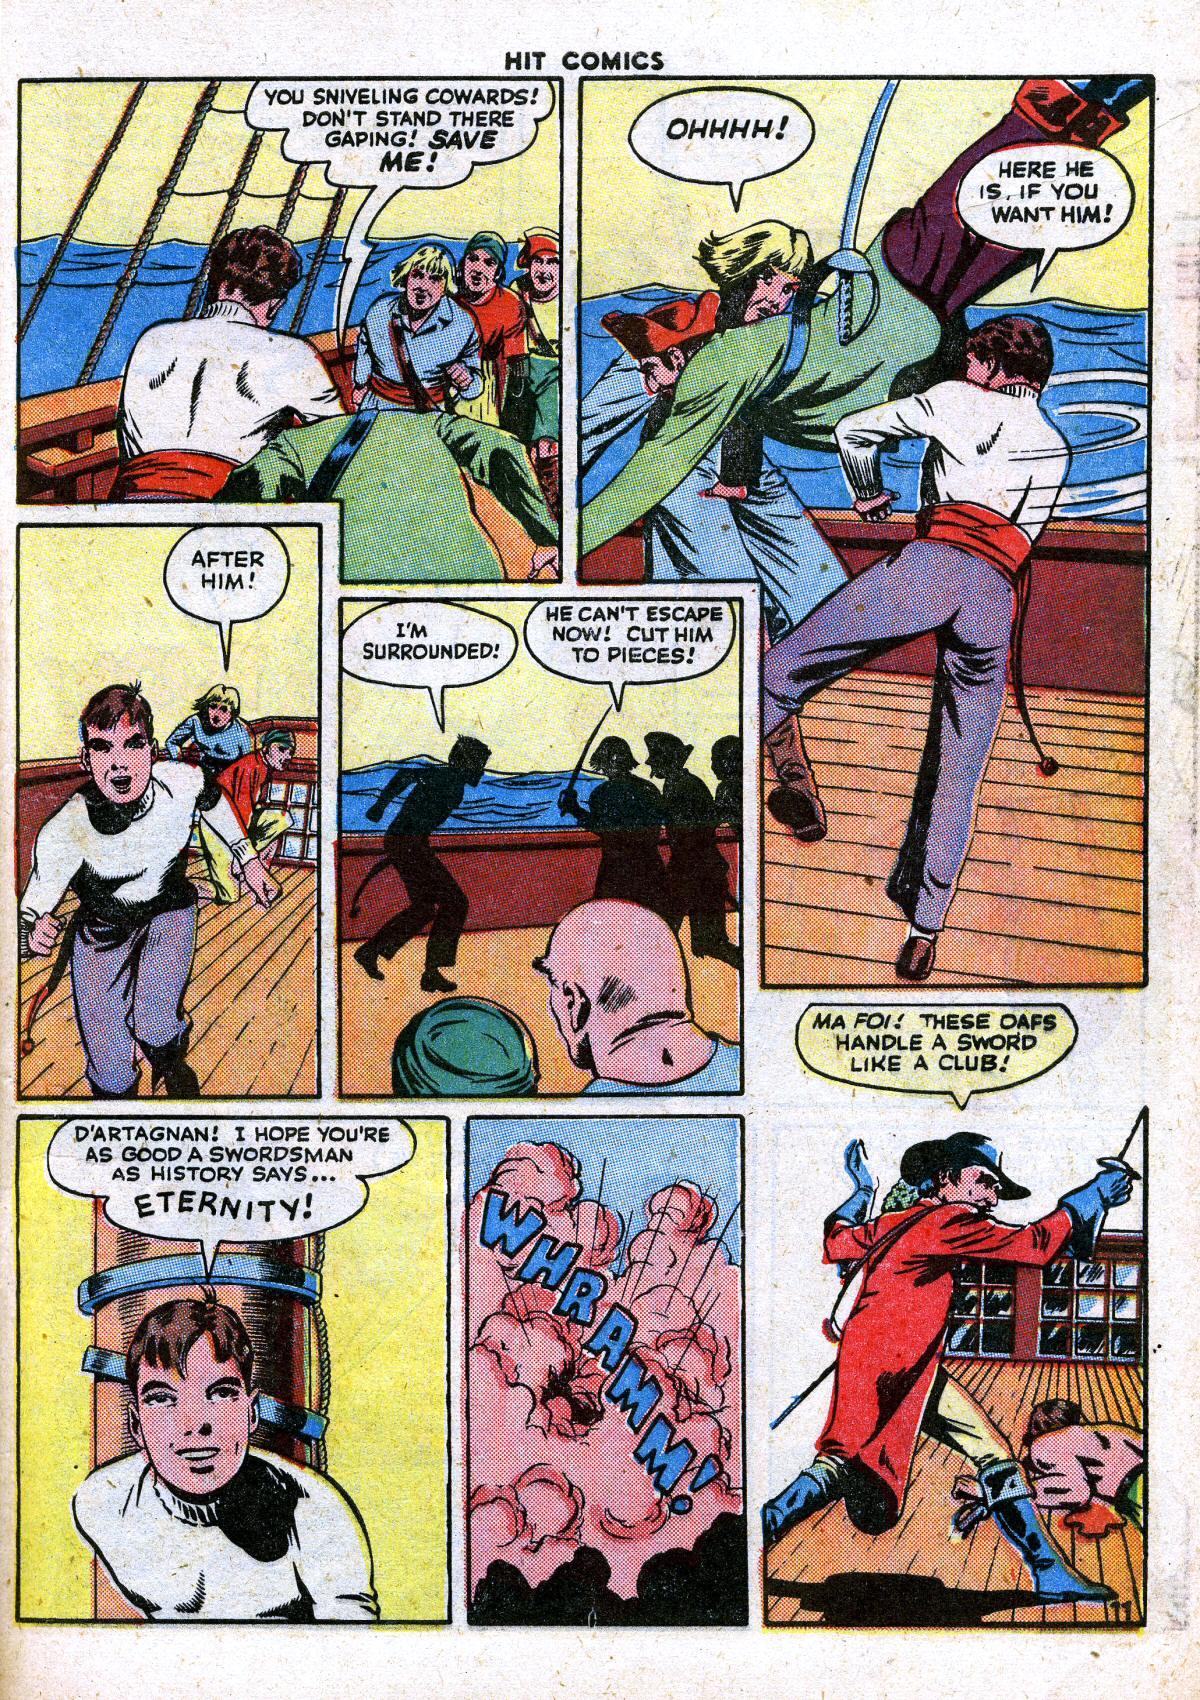 Read online Hit Comics comic -  Issue #41 - 13